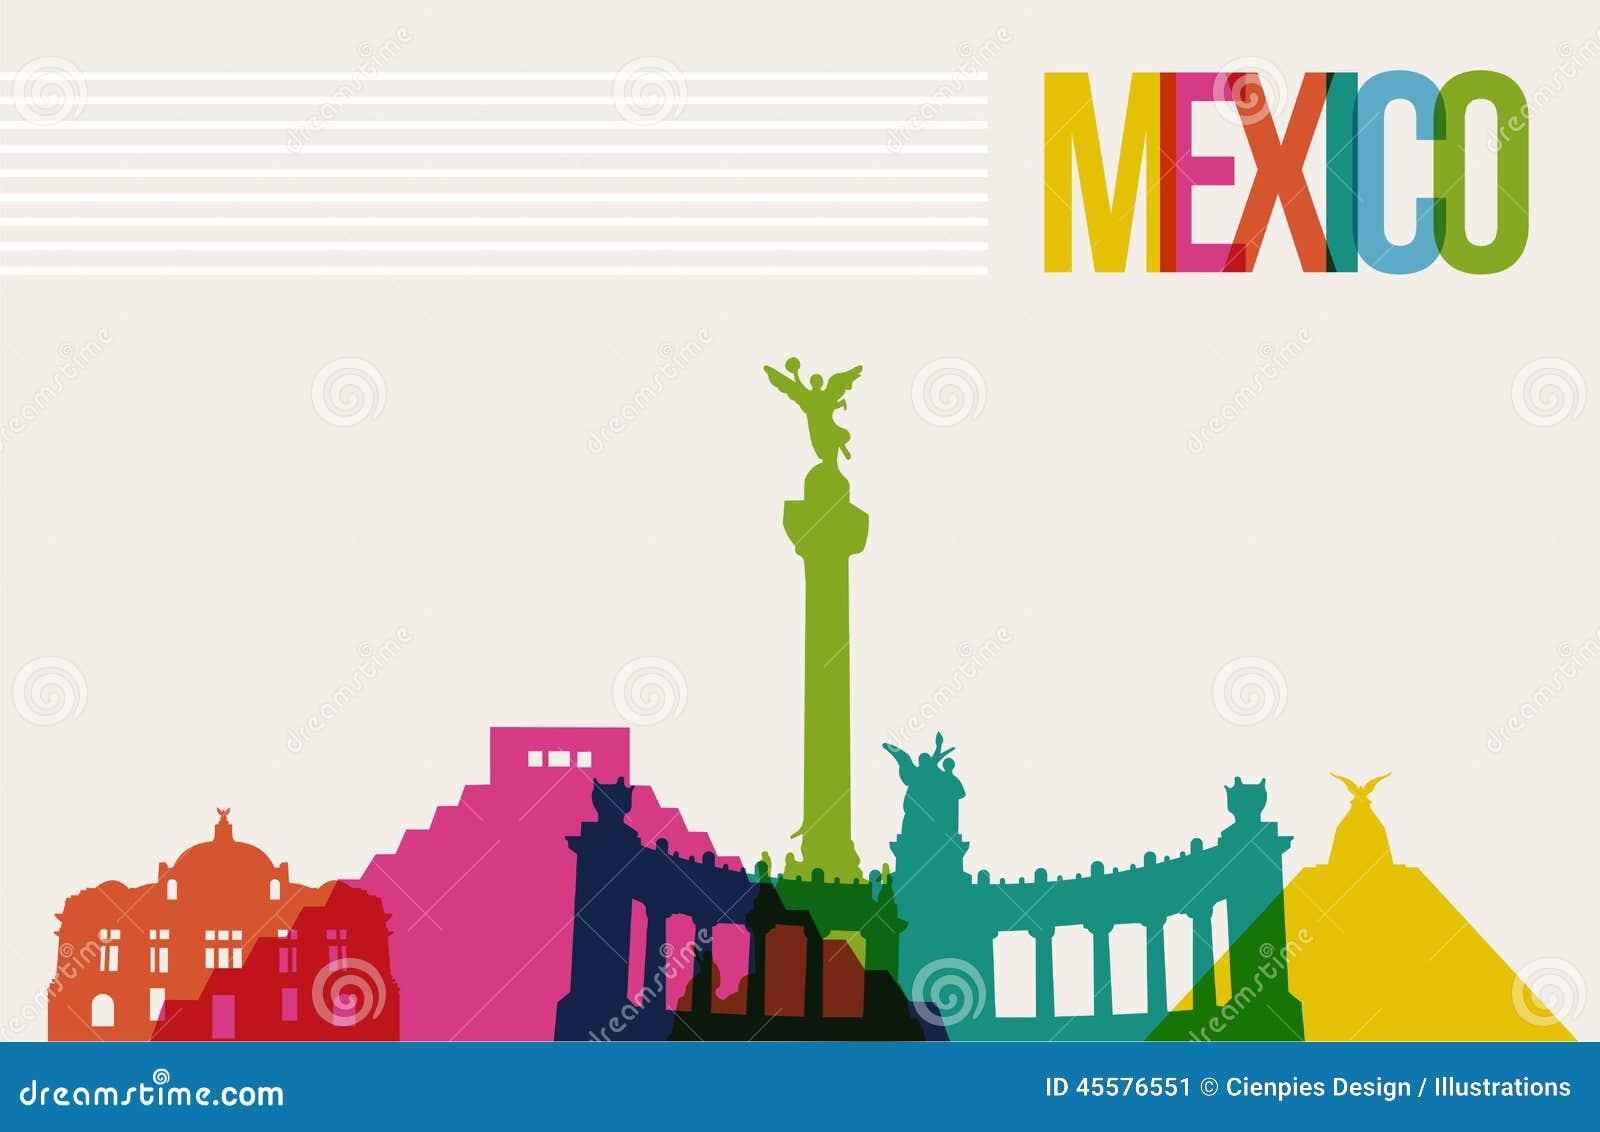 Travel México destination landmarks skyline background